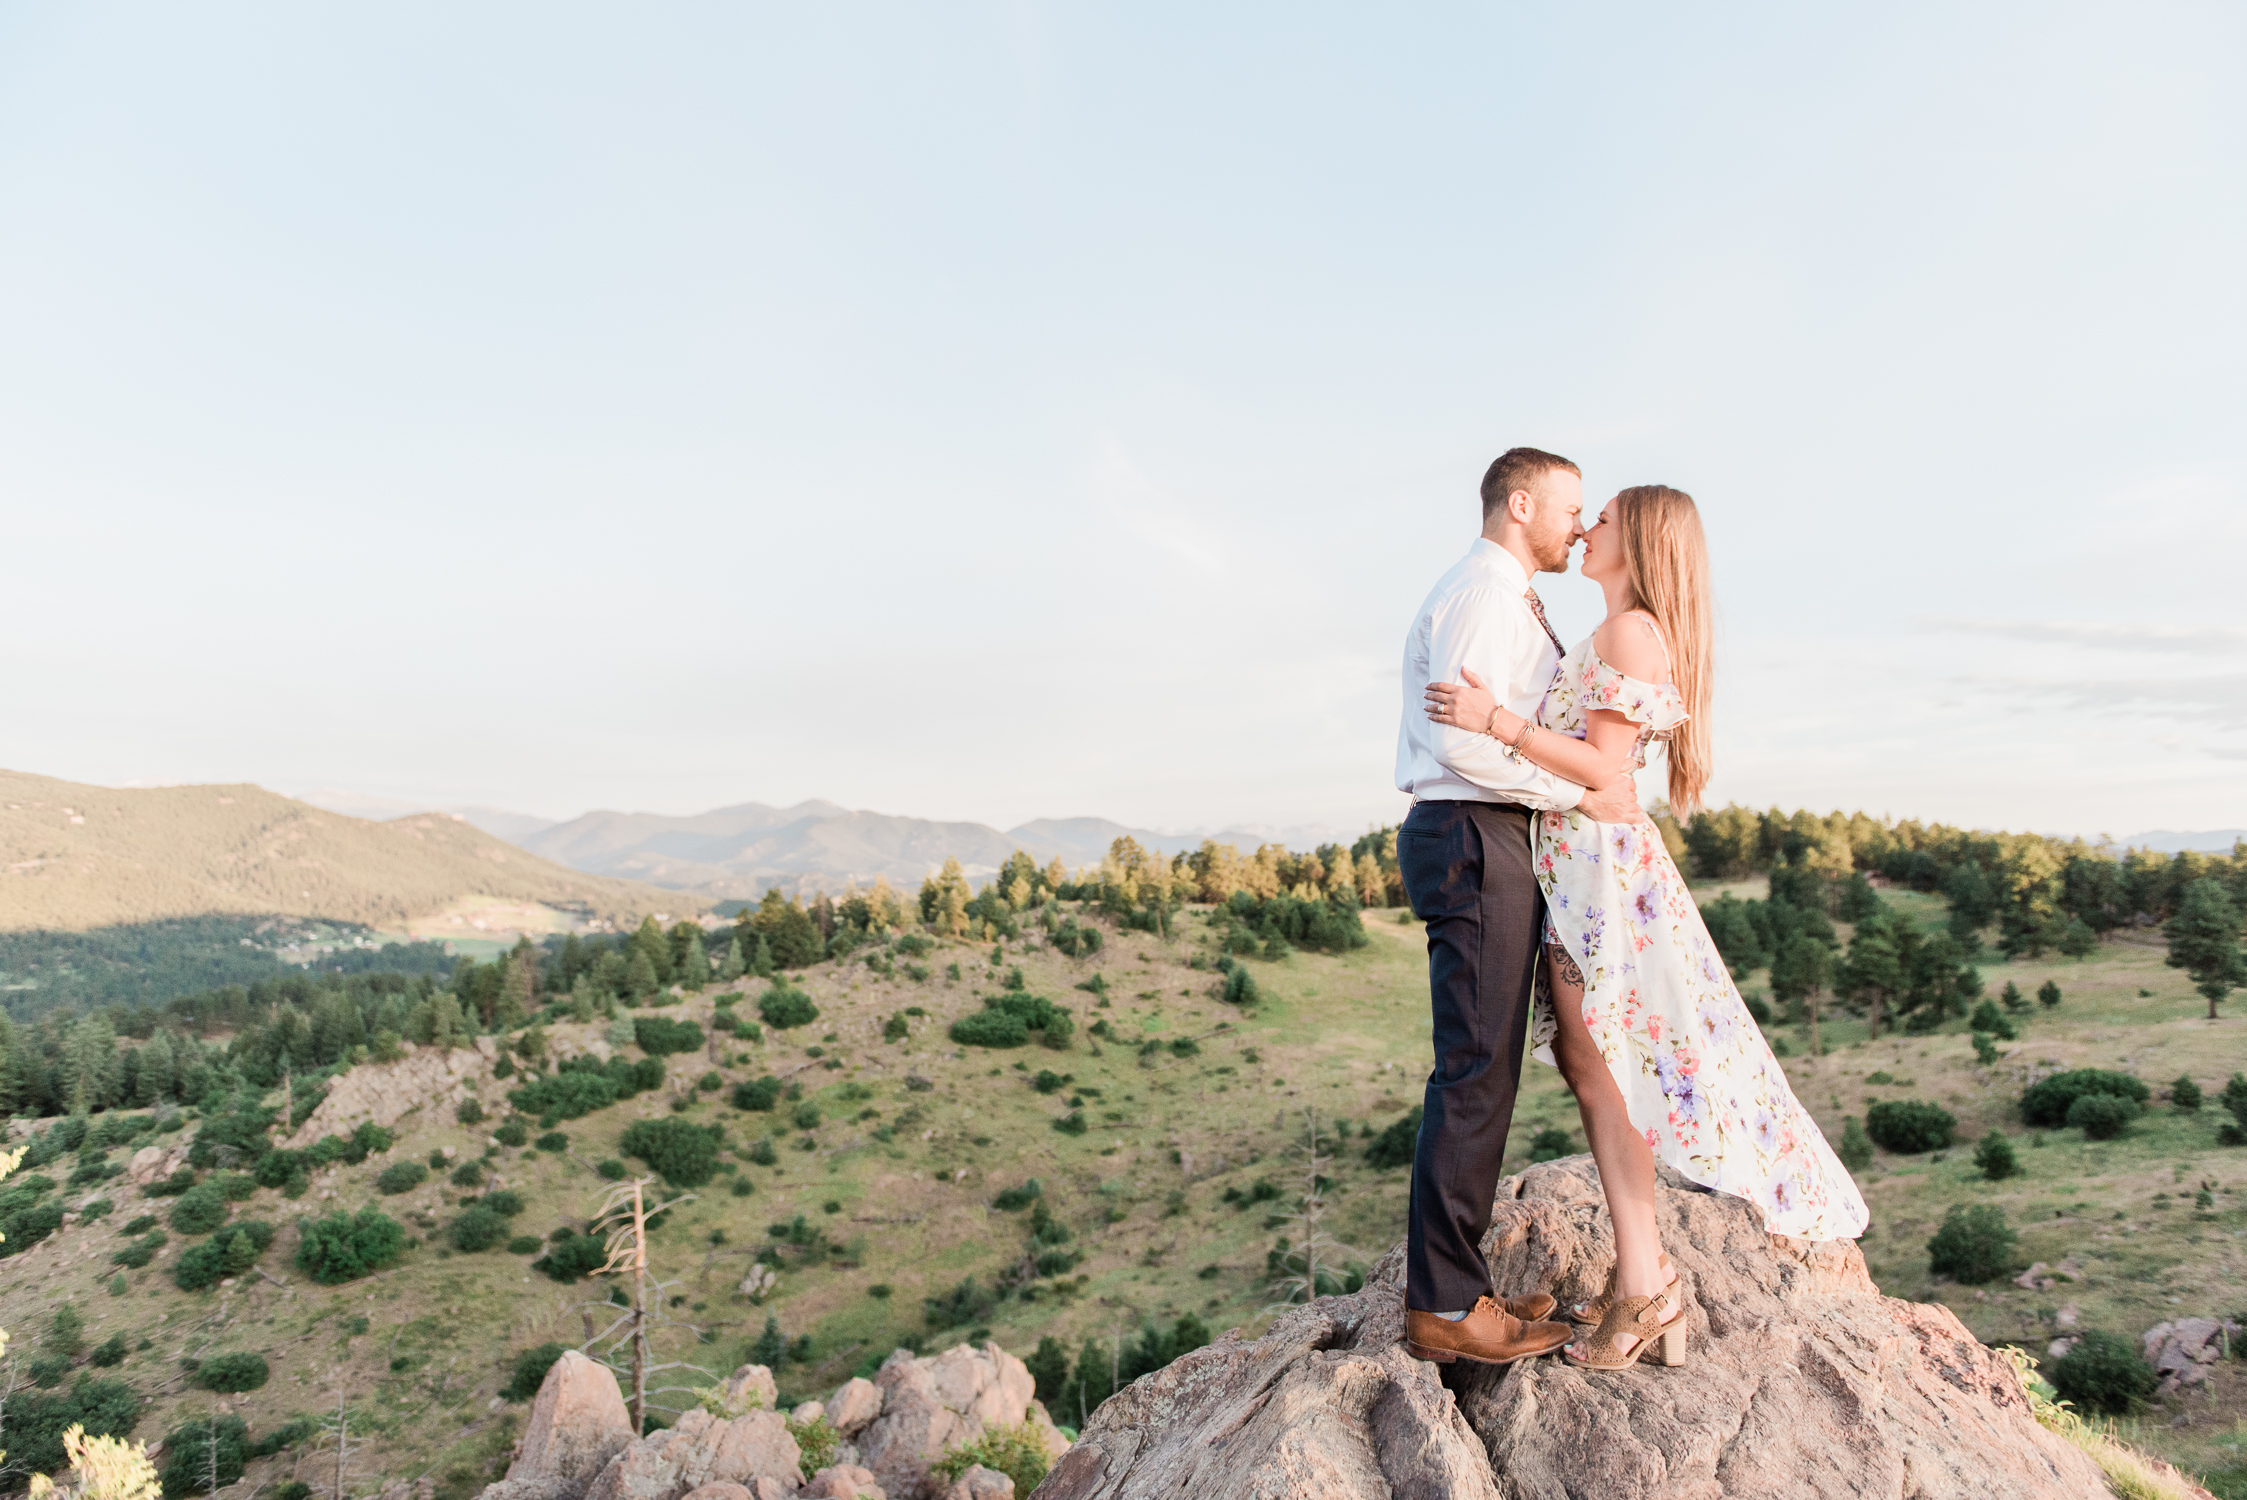 2019-08-30-Engagement-Morgan-Adam-MtFalcon-1225.jpg